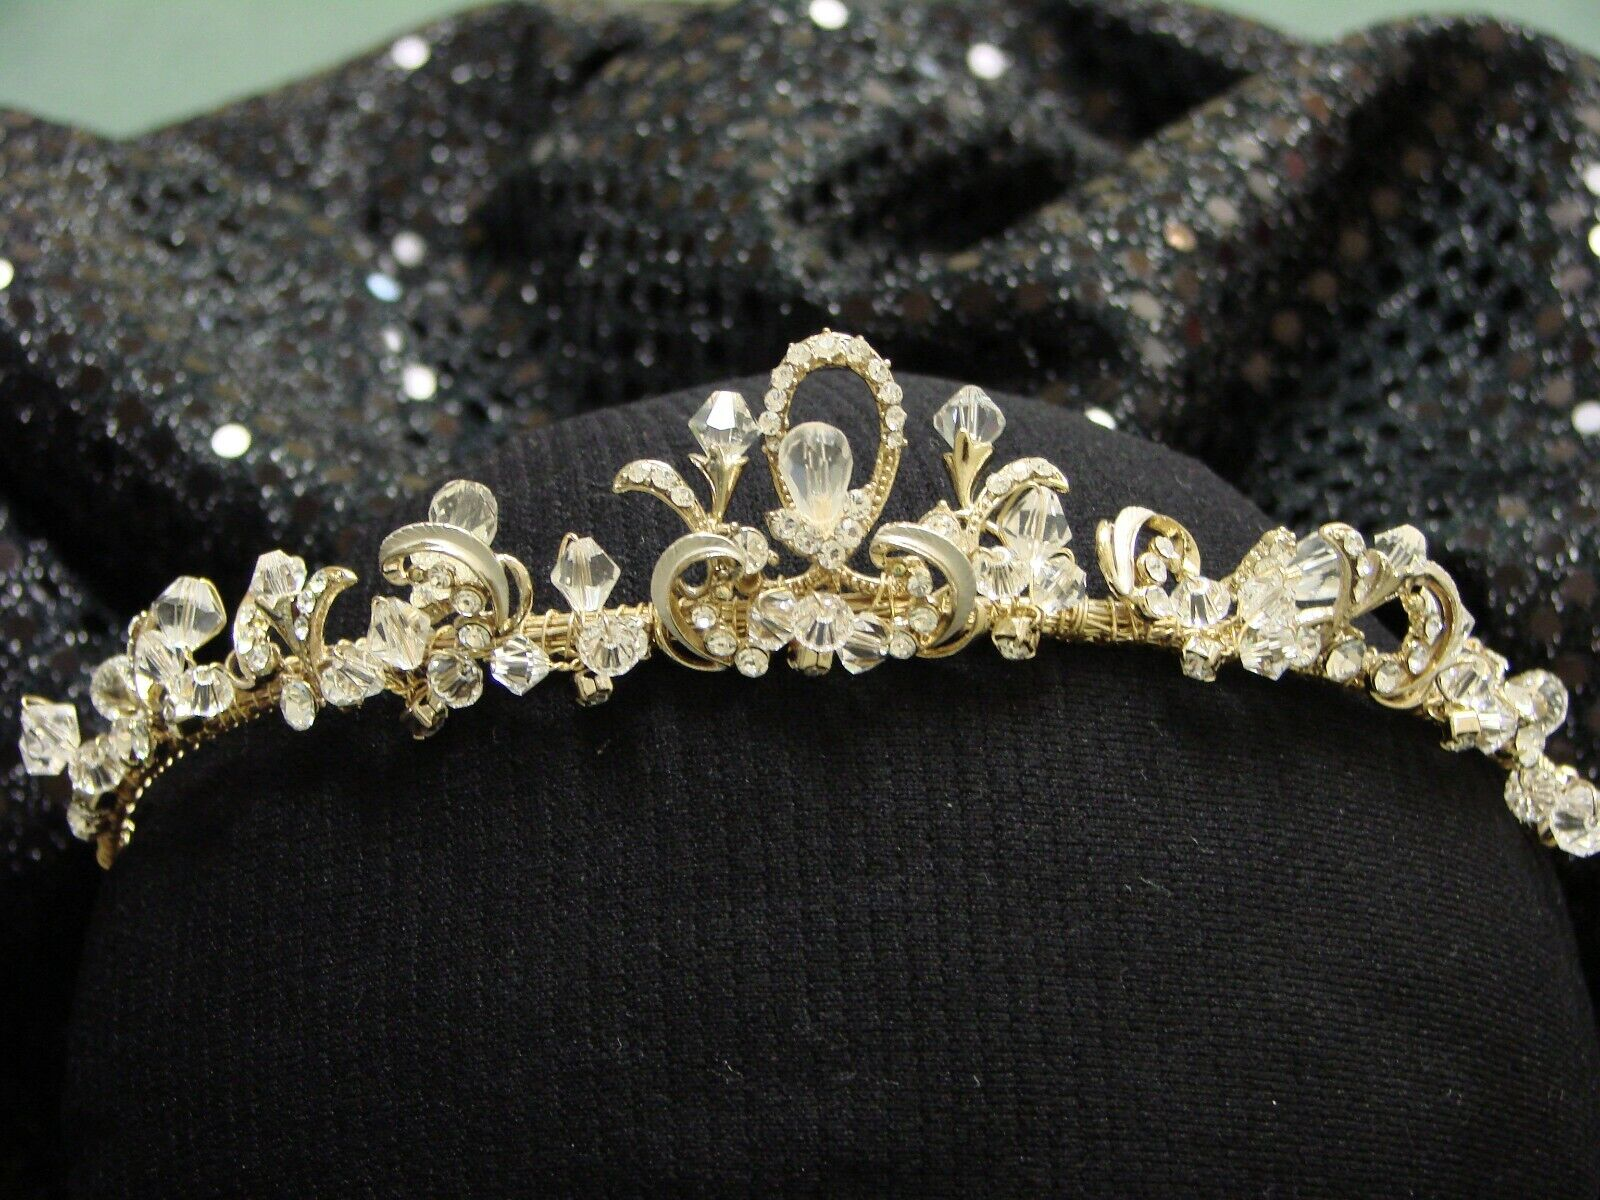 Bridal Headband Crystal & rhinestone,TIARA, silver/gold. New with Tags